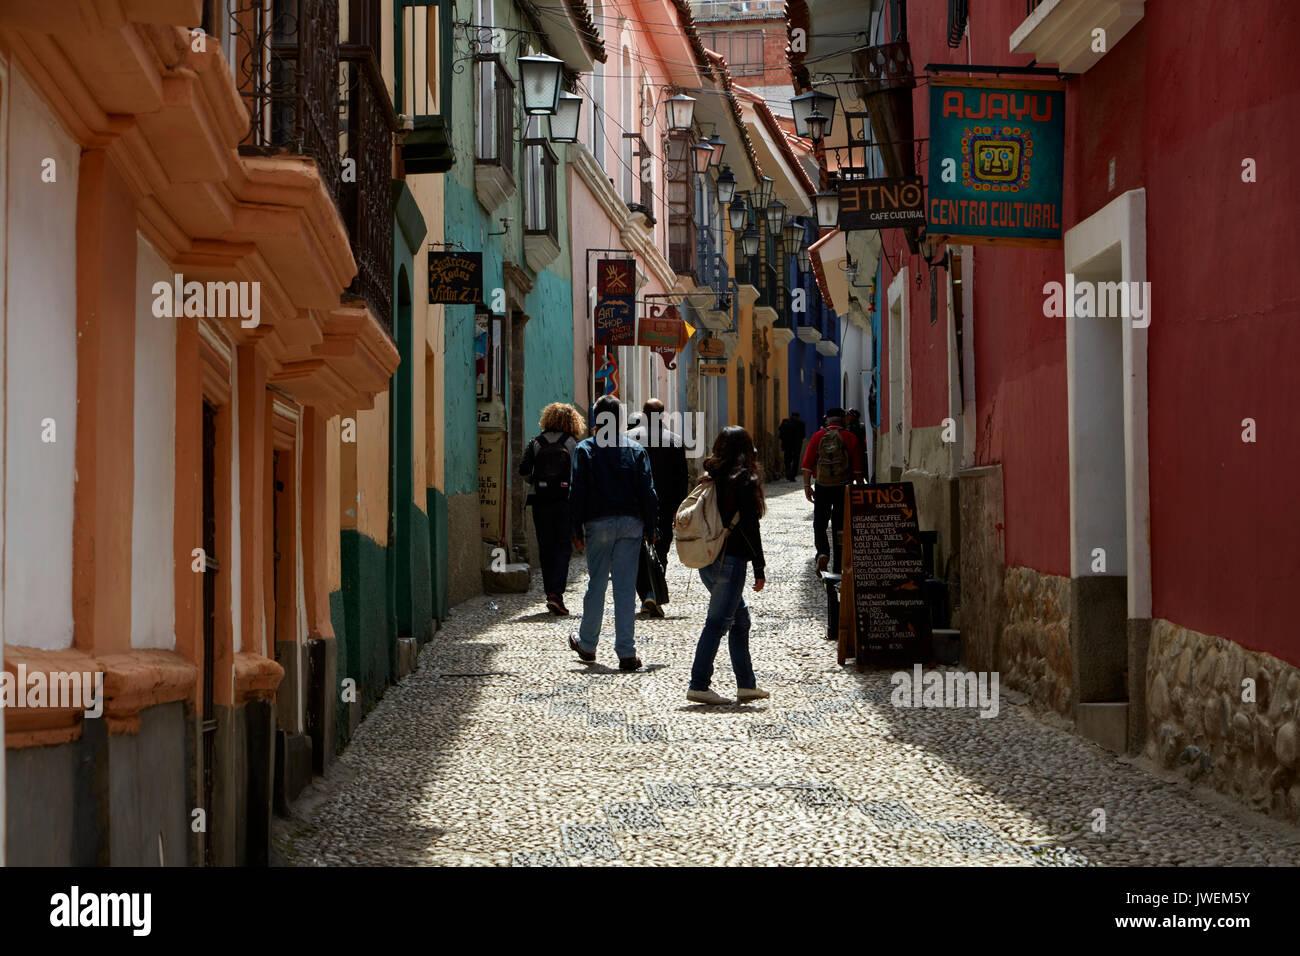 Narrow steep cobbled street of Calle Jaen, La Paz, Bolivia, South America - Stock Image